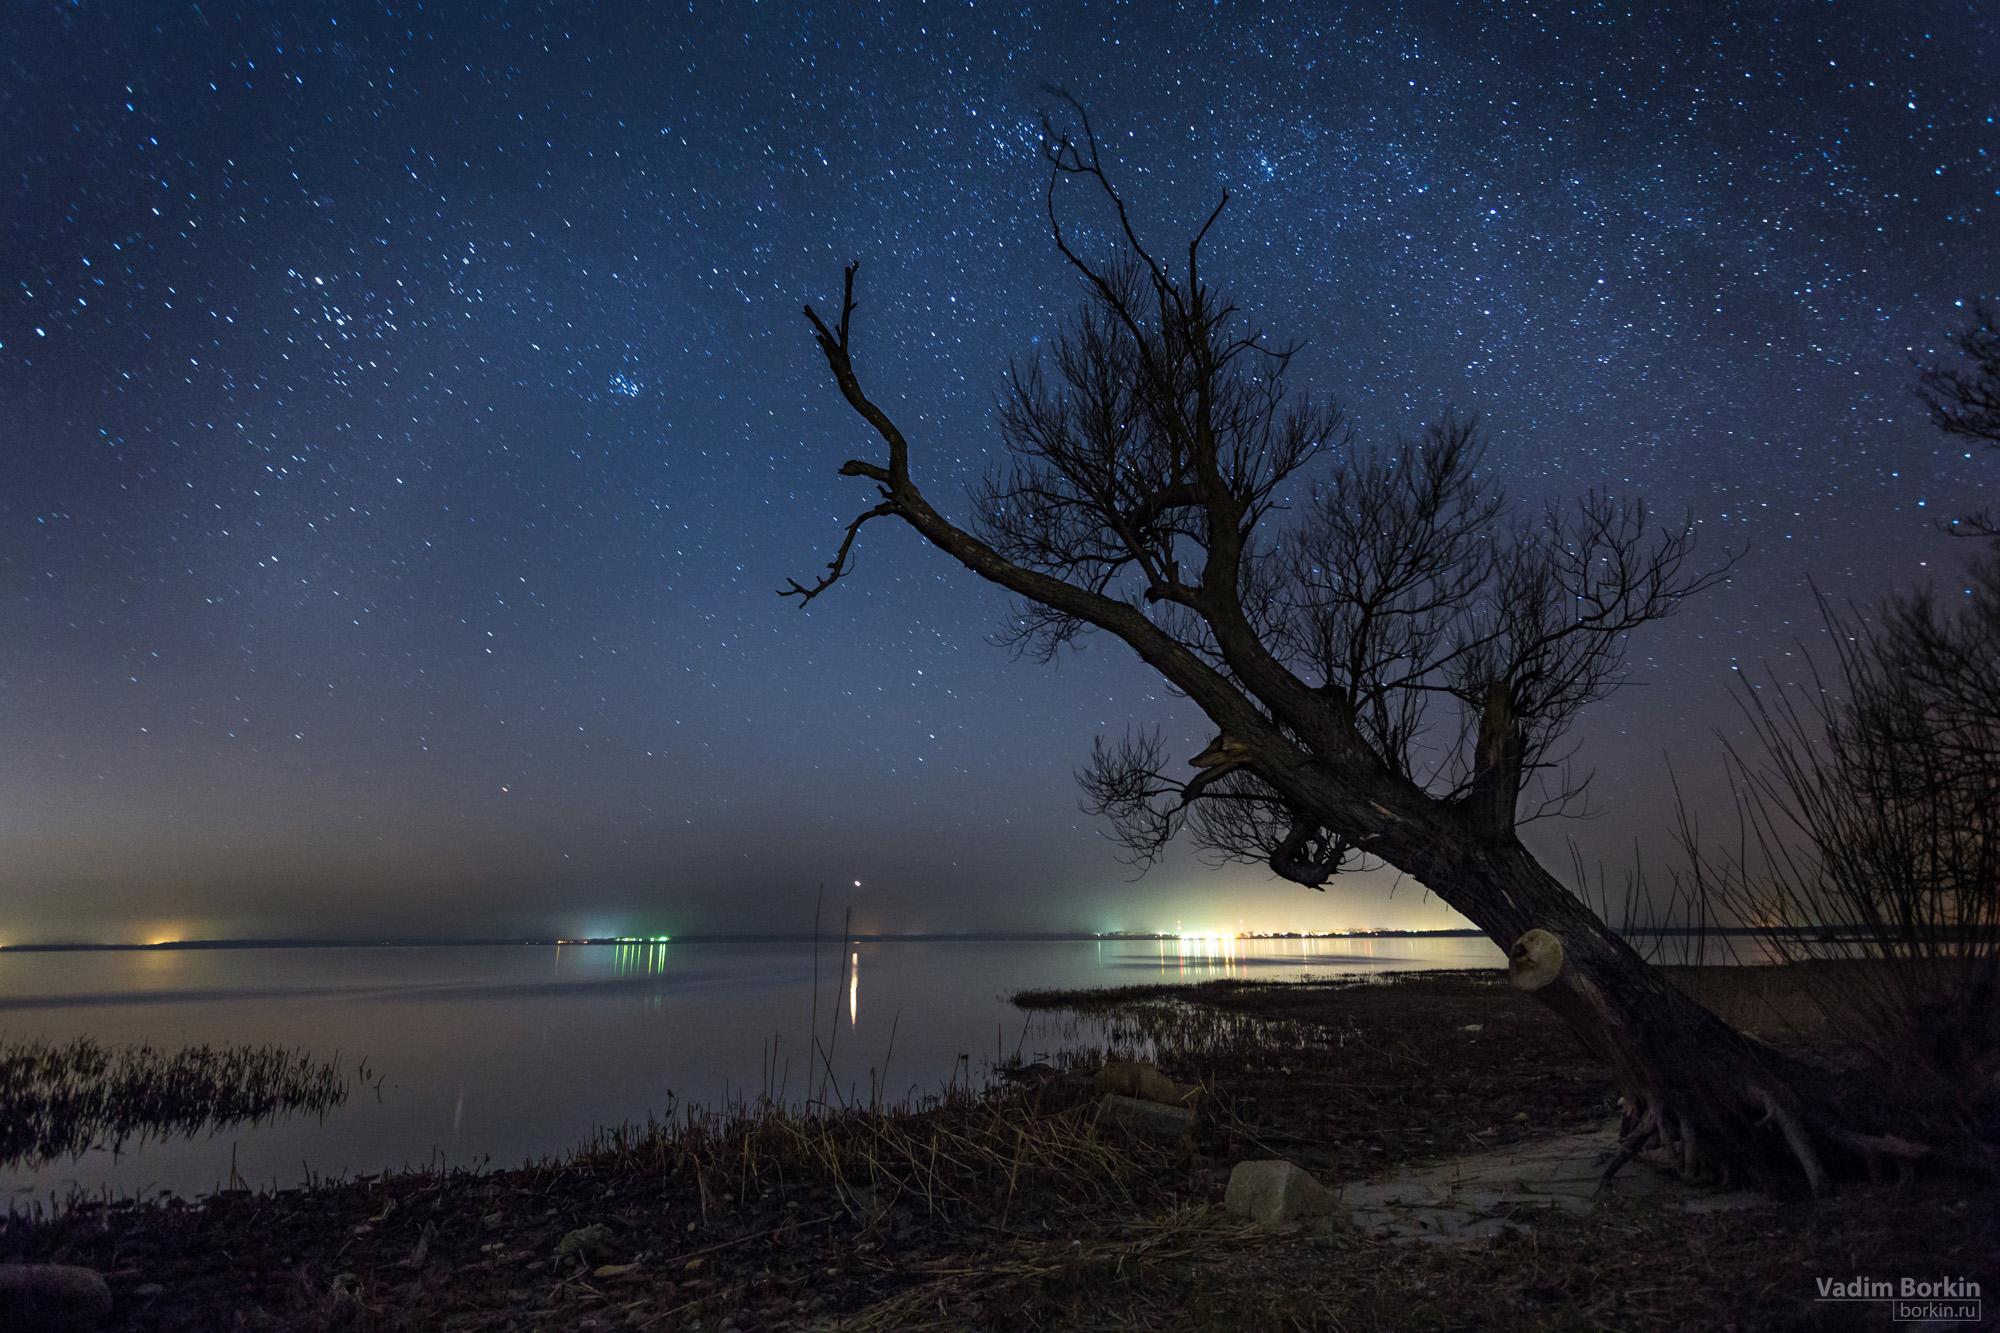 фото пейзаж со звездным небом